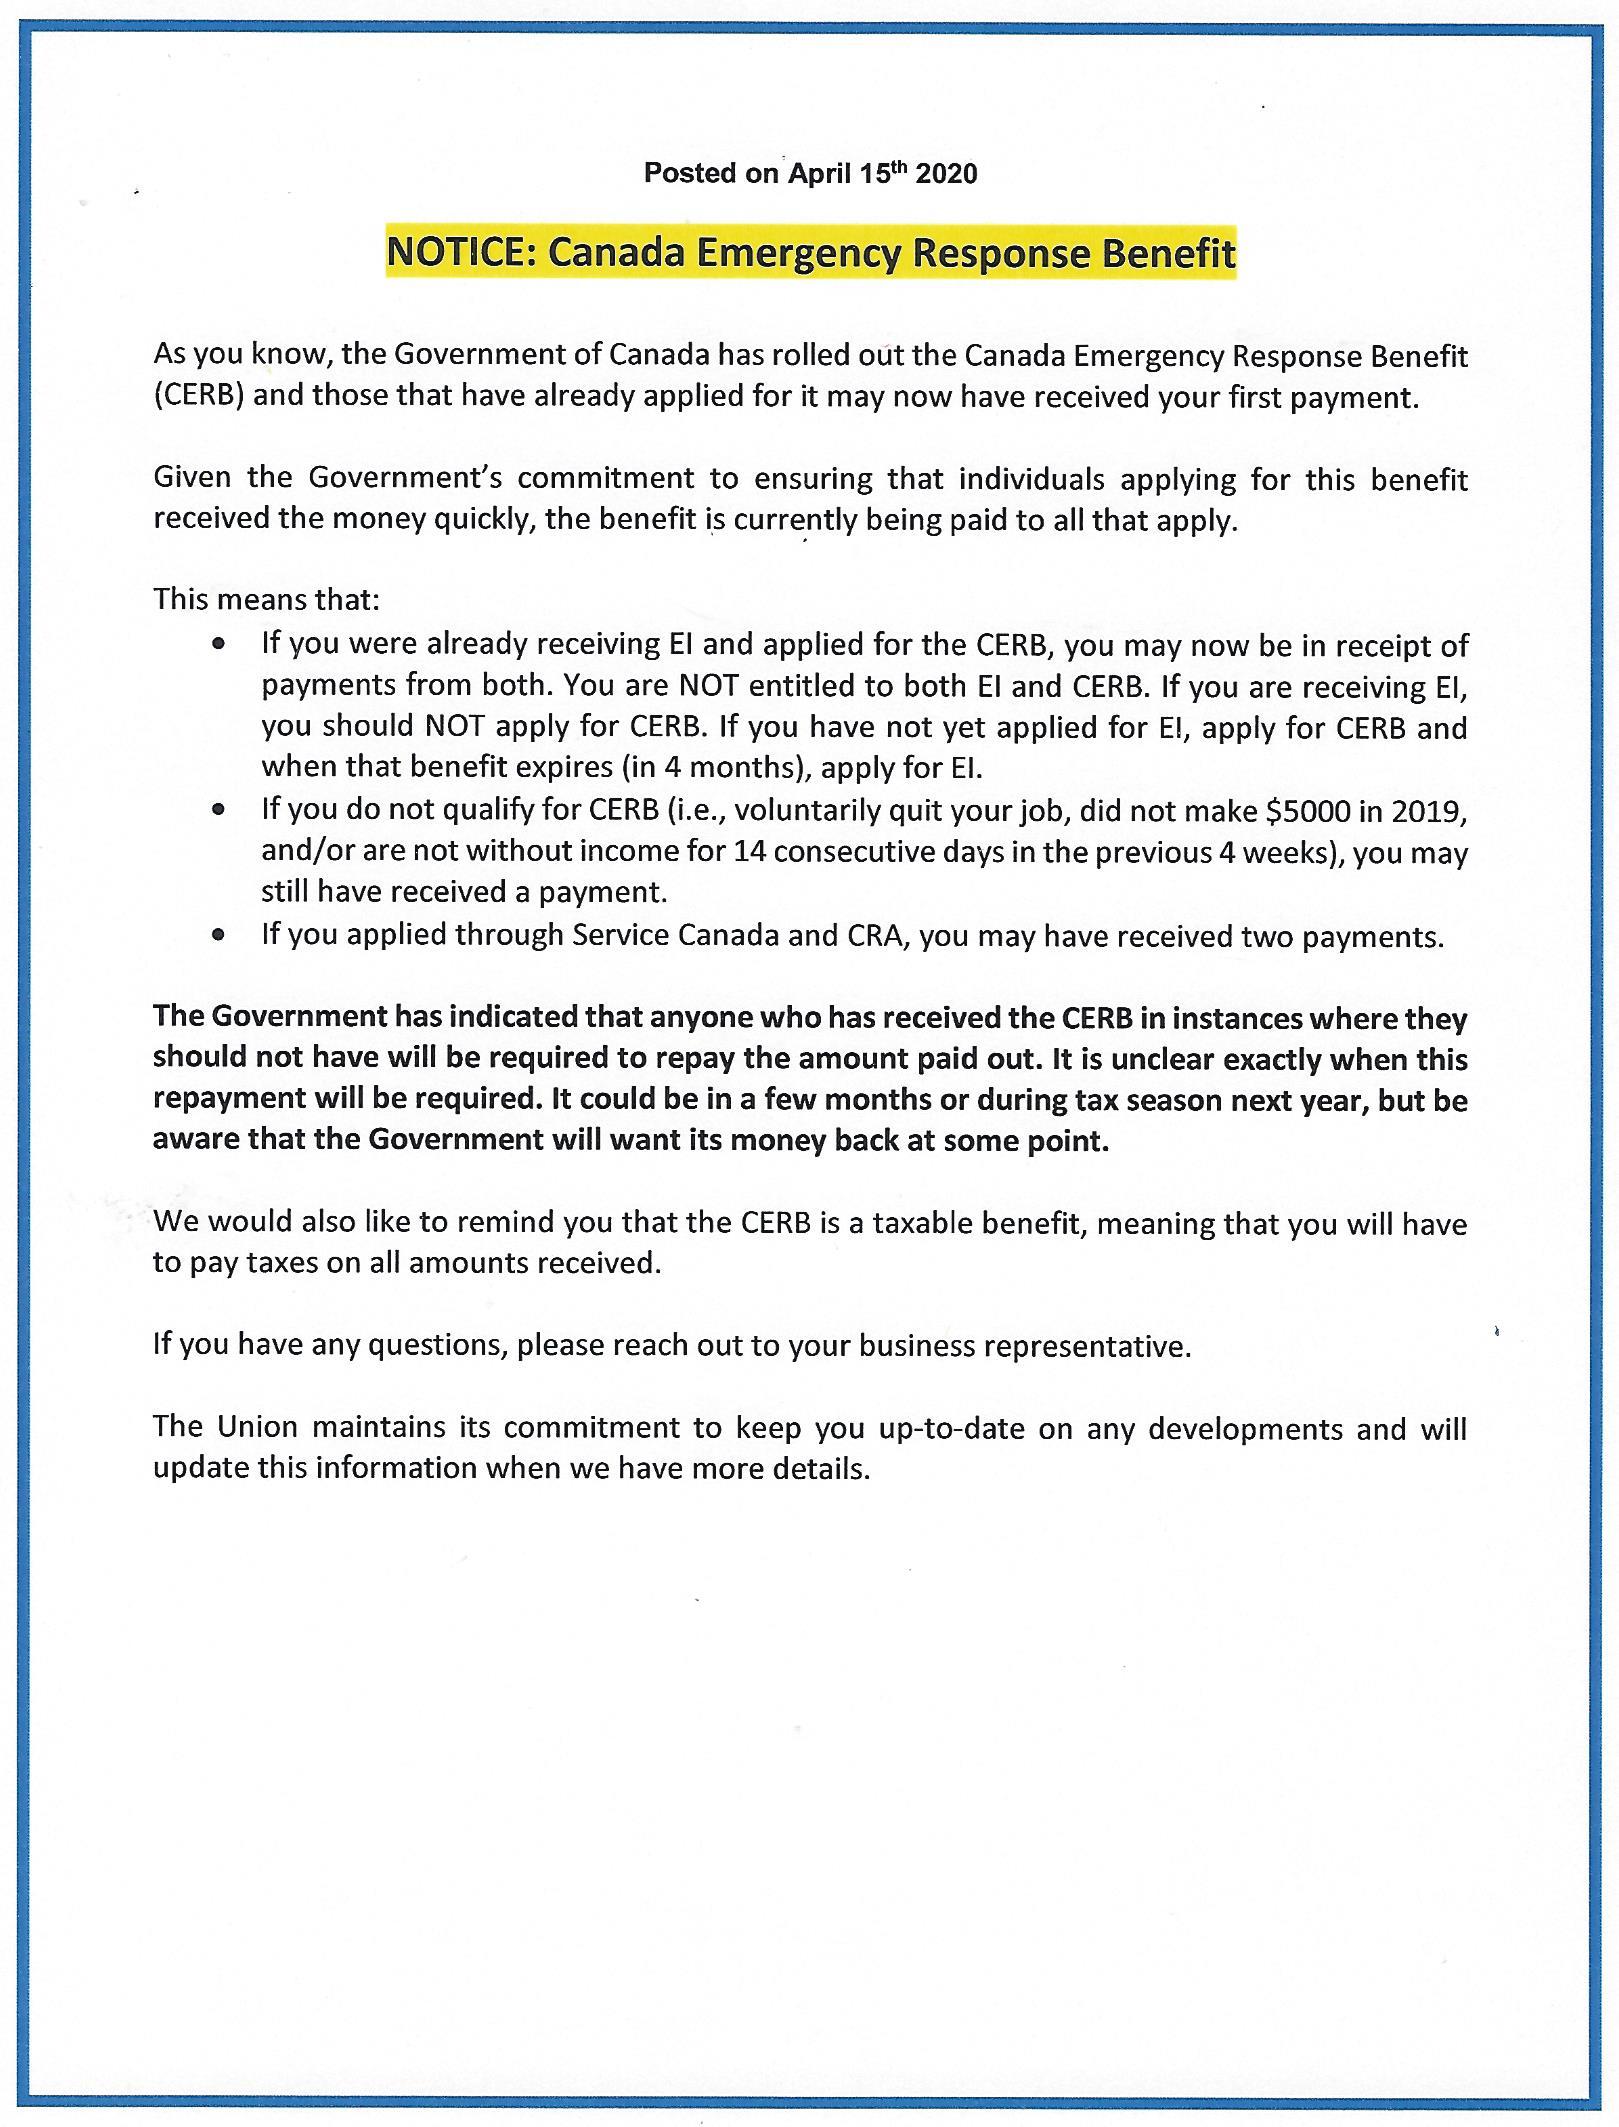 2020.04.14-COVID_CERB_&_EI_Benefit_CDC_Memo.jpg